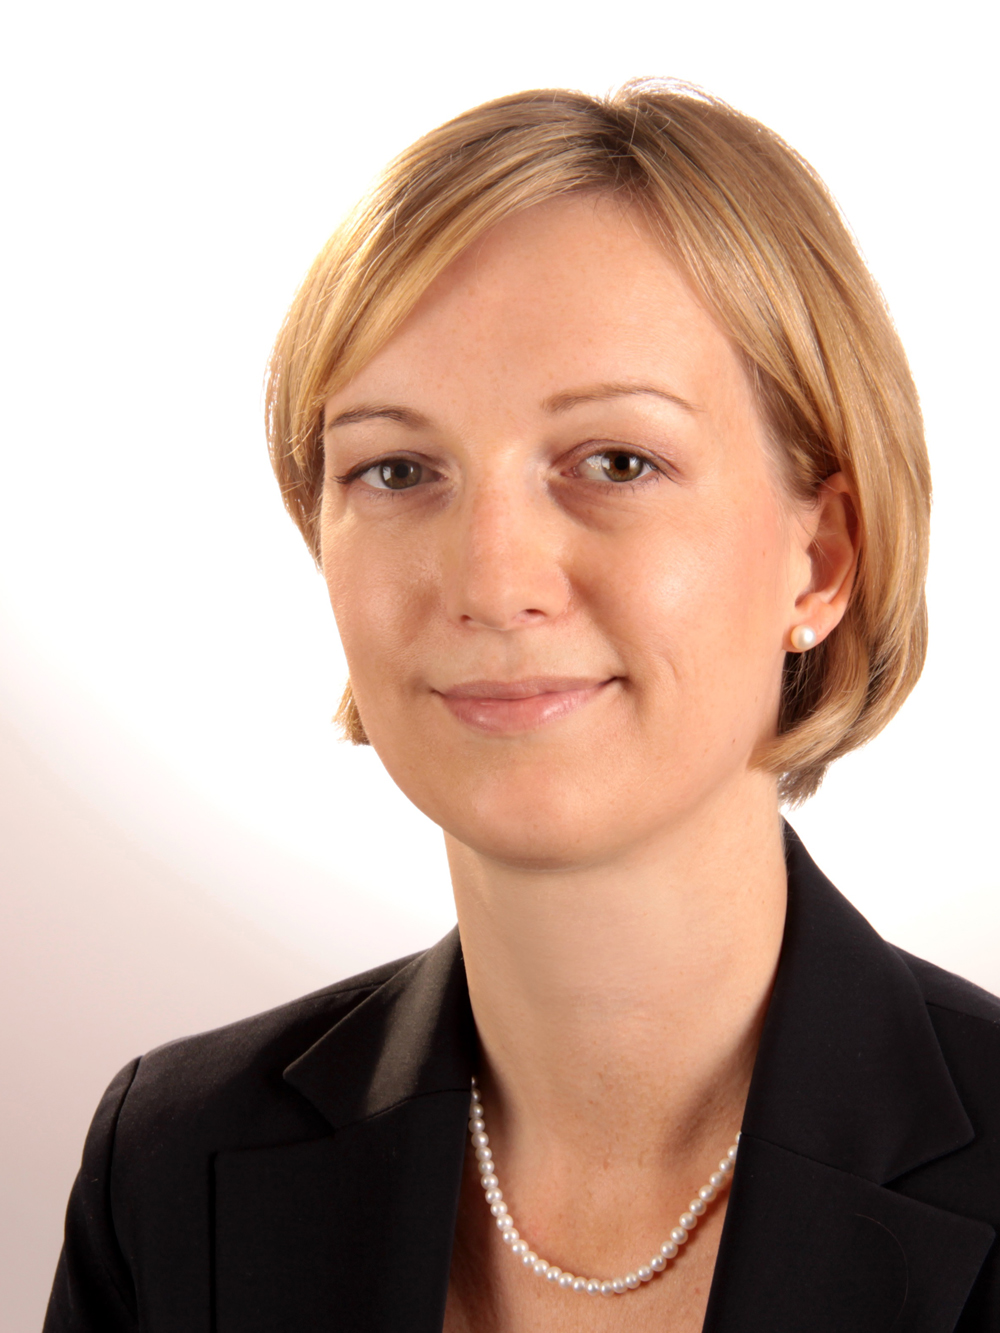 Dr. Jessica Peter